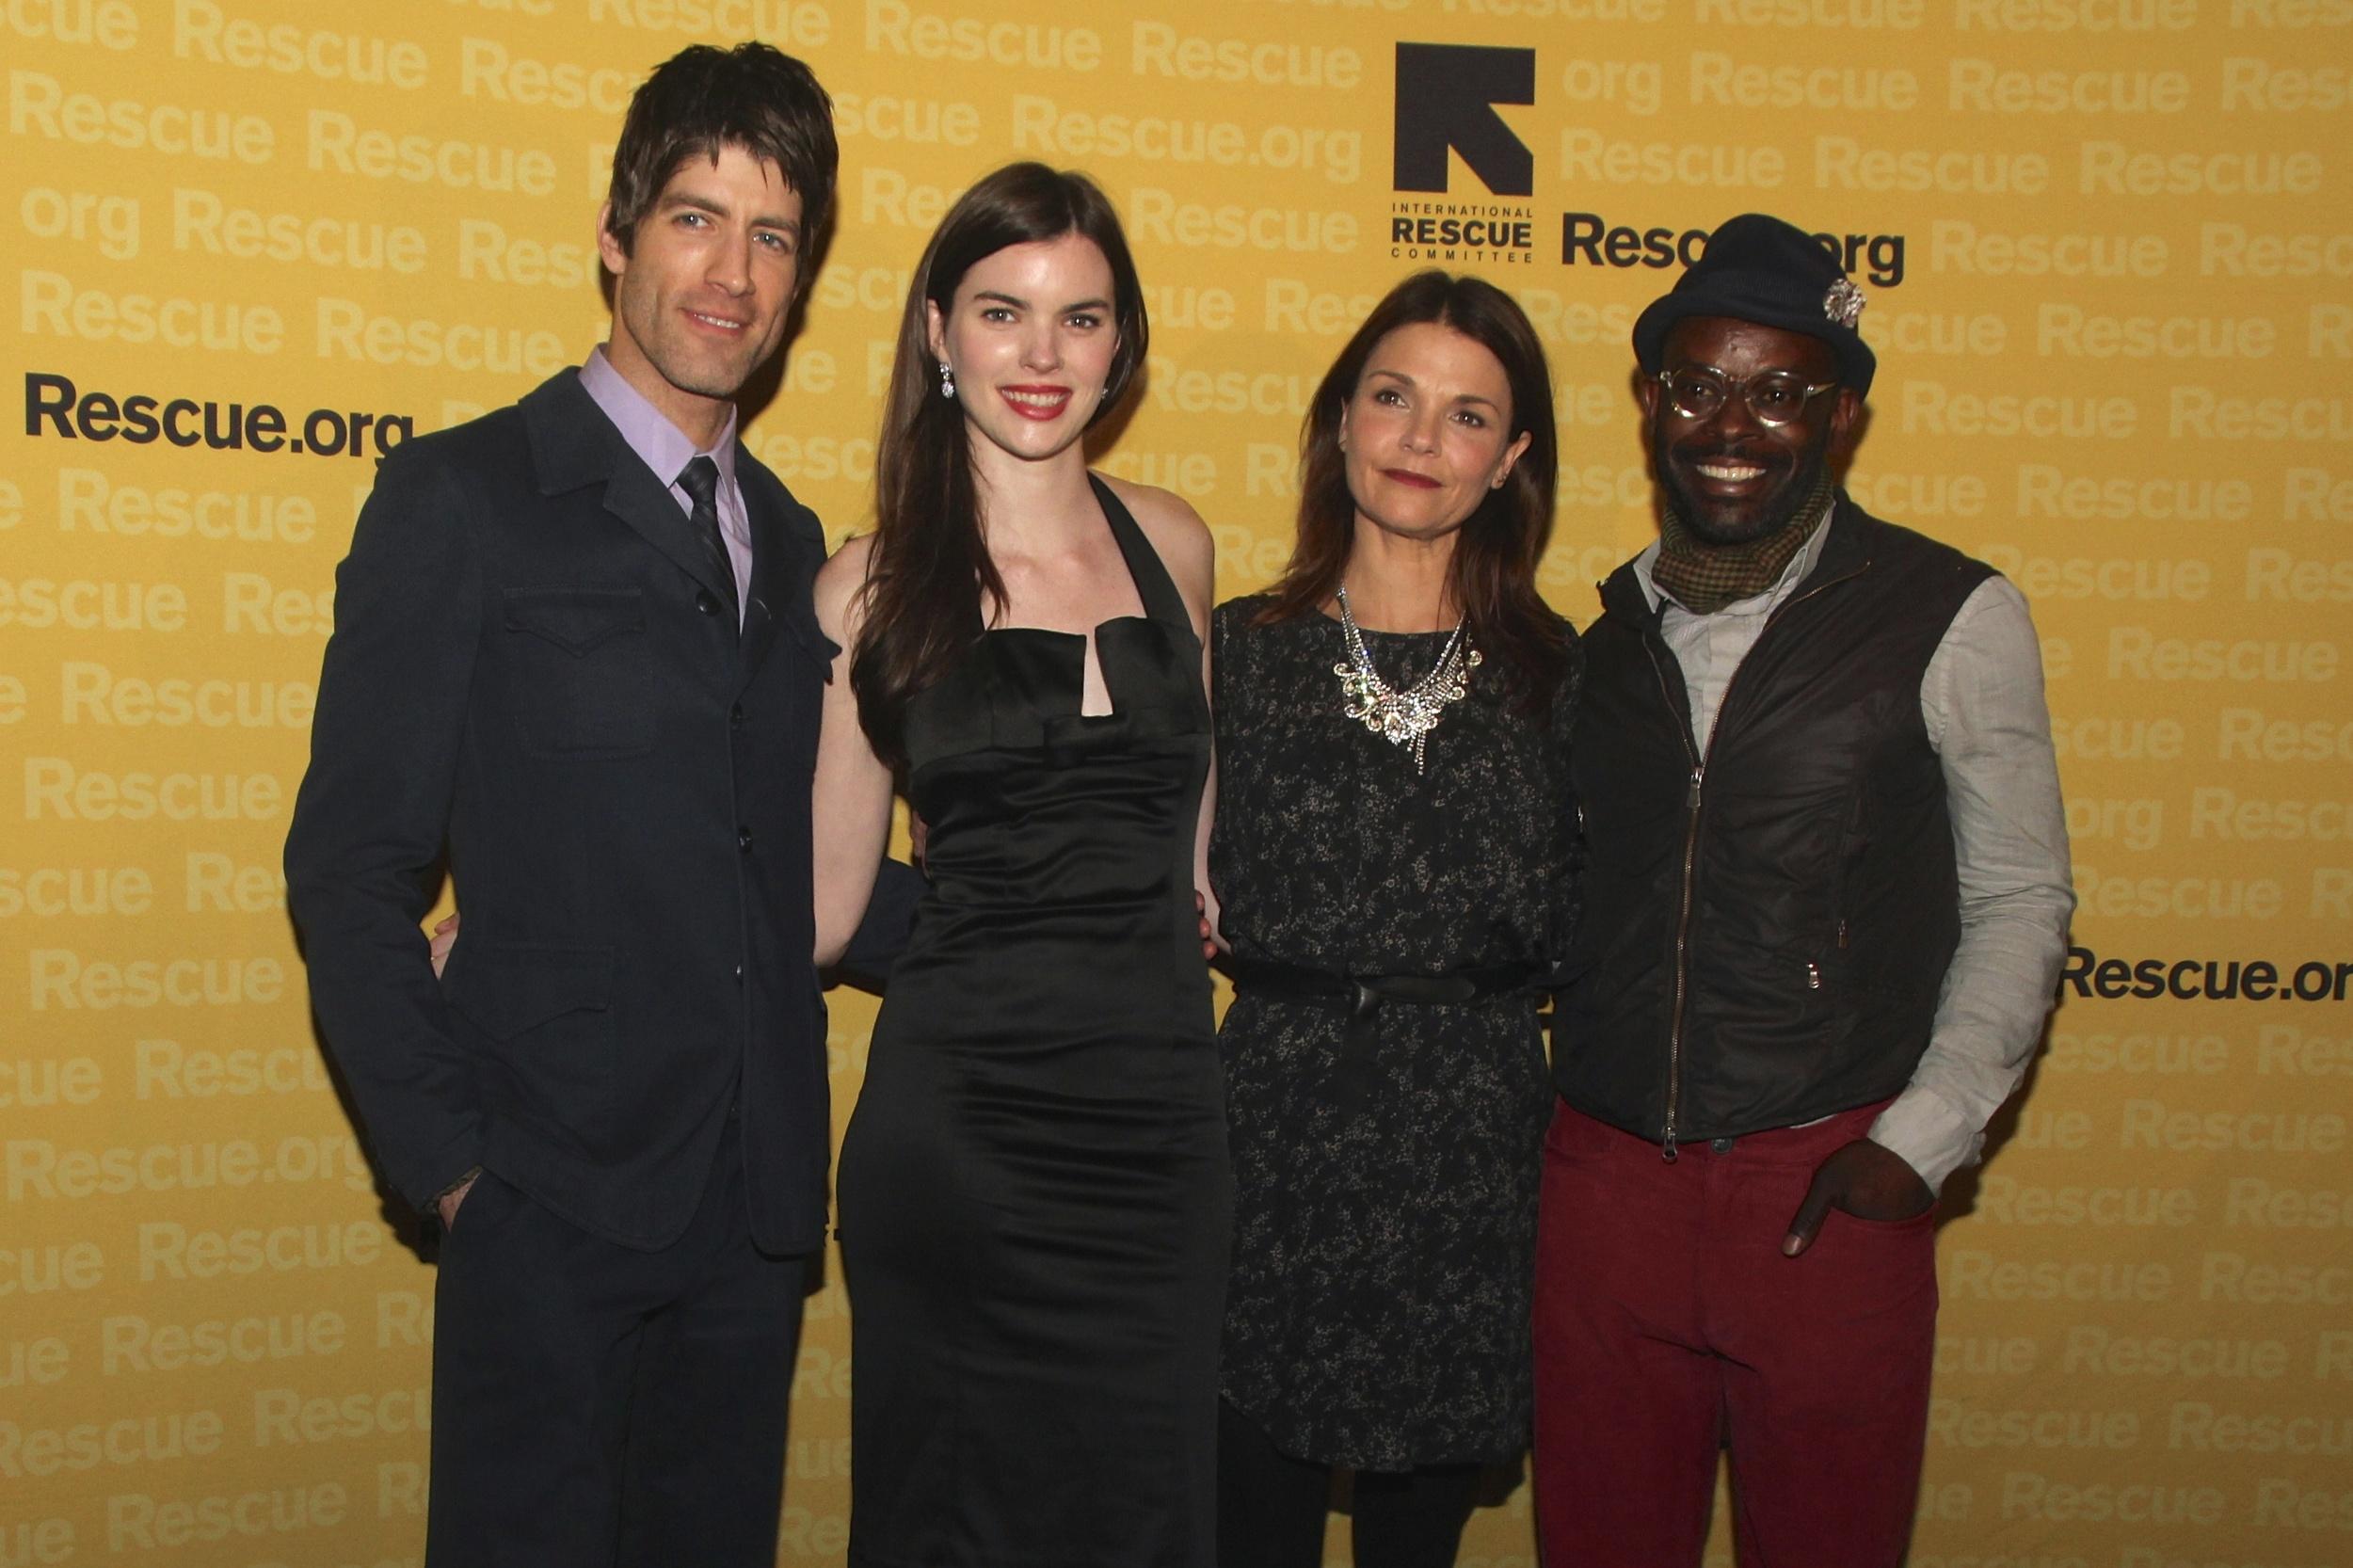 Brad Raider, Kaley Ronayne, Katie Erbe, and Sahr Ngaujah at the IRC Freedom Awards, Waldorf Astoria, NYC - November 6th, 2013